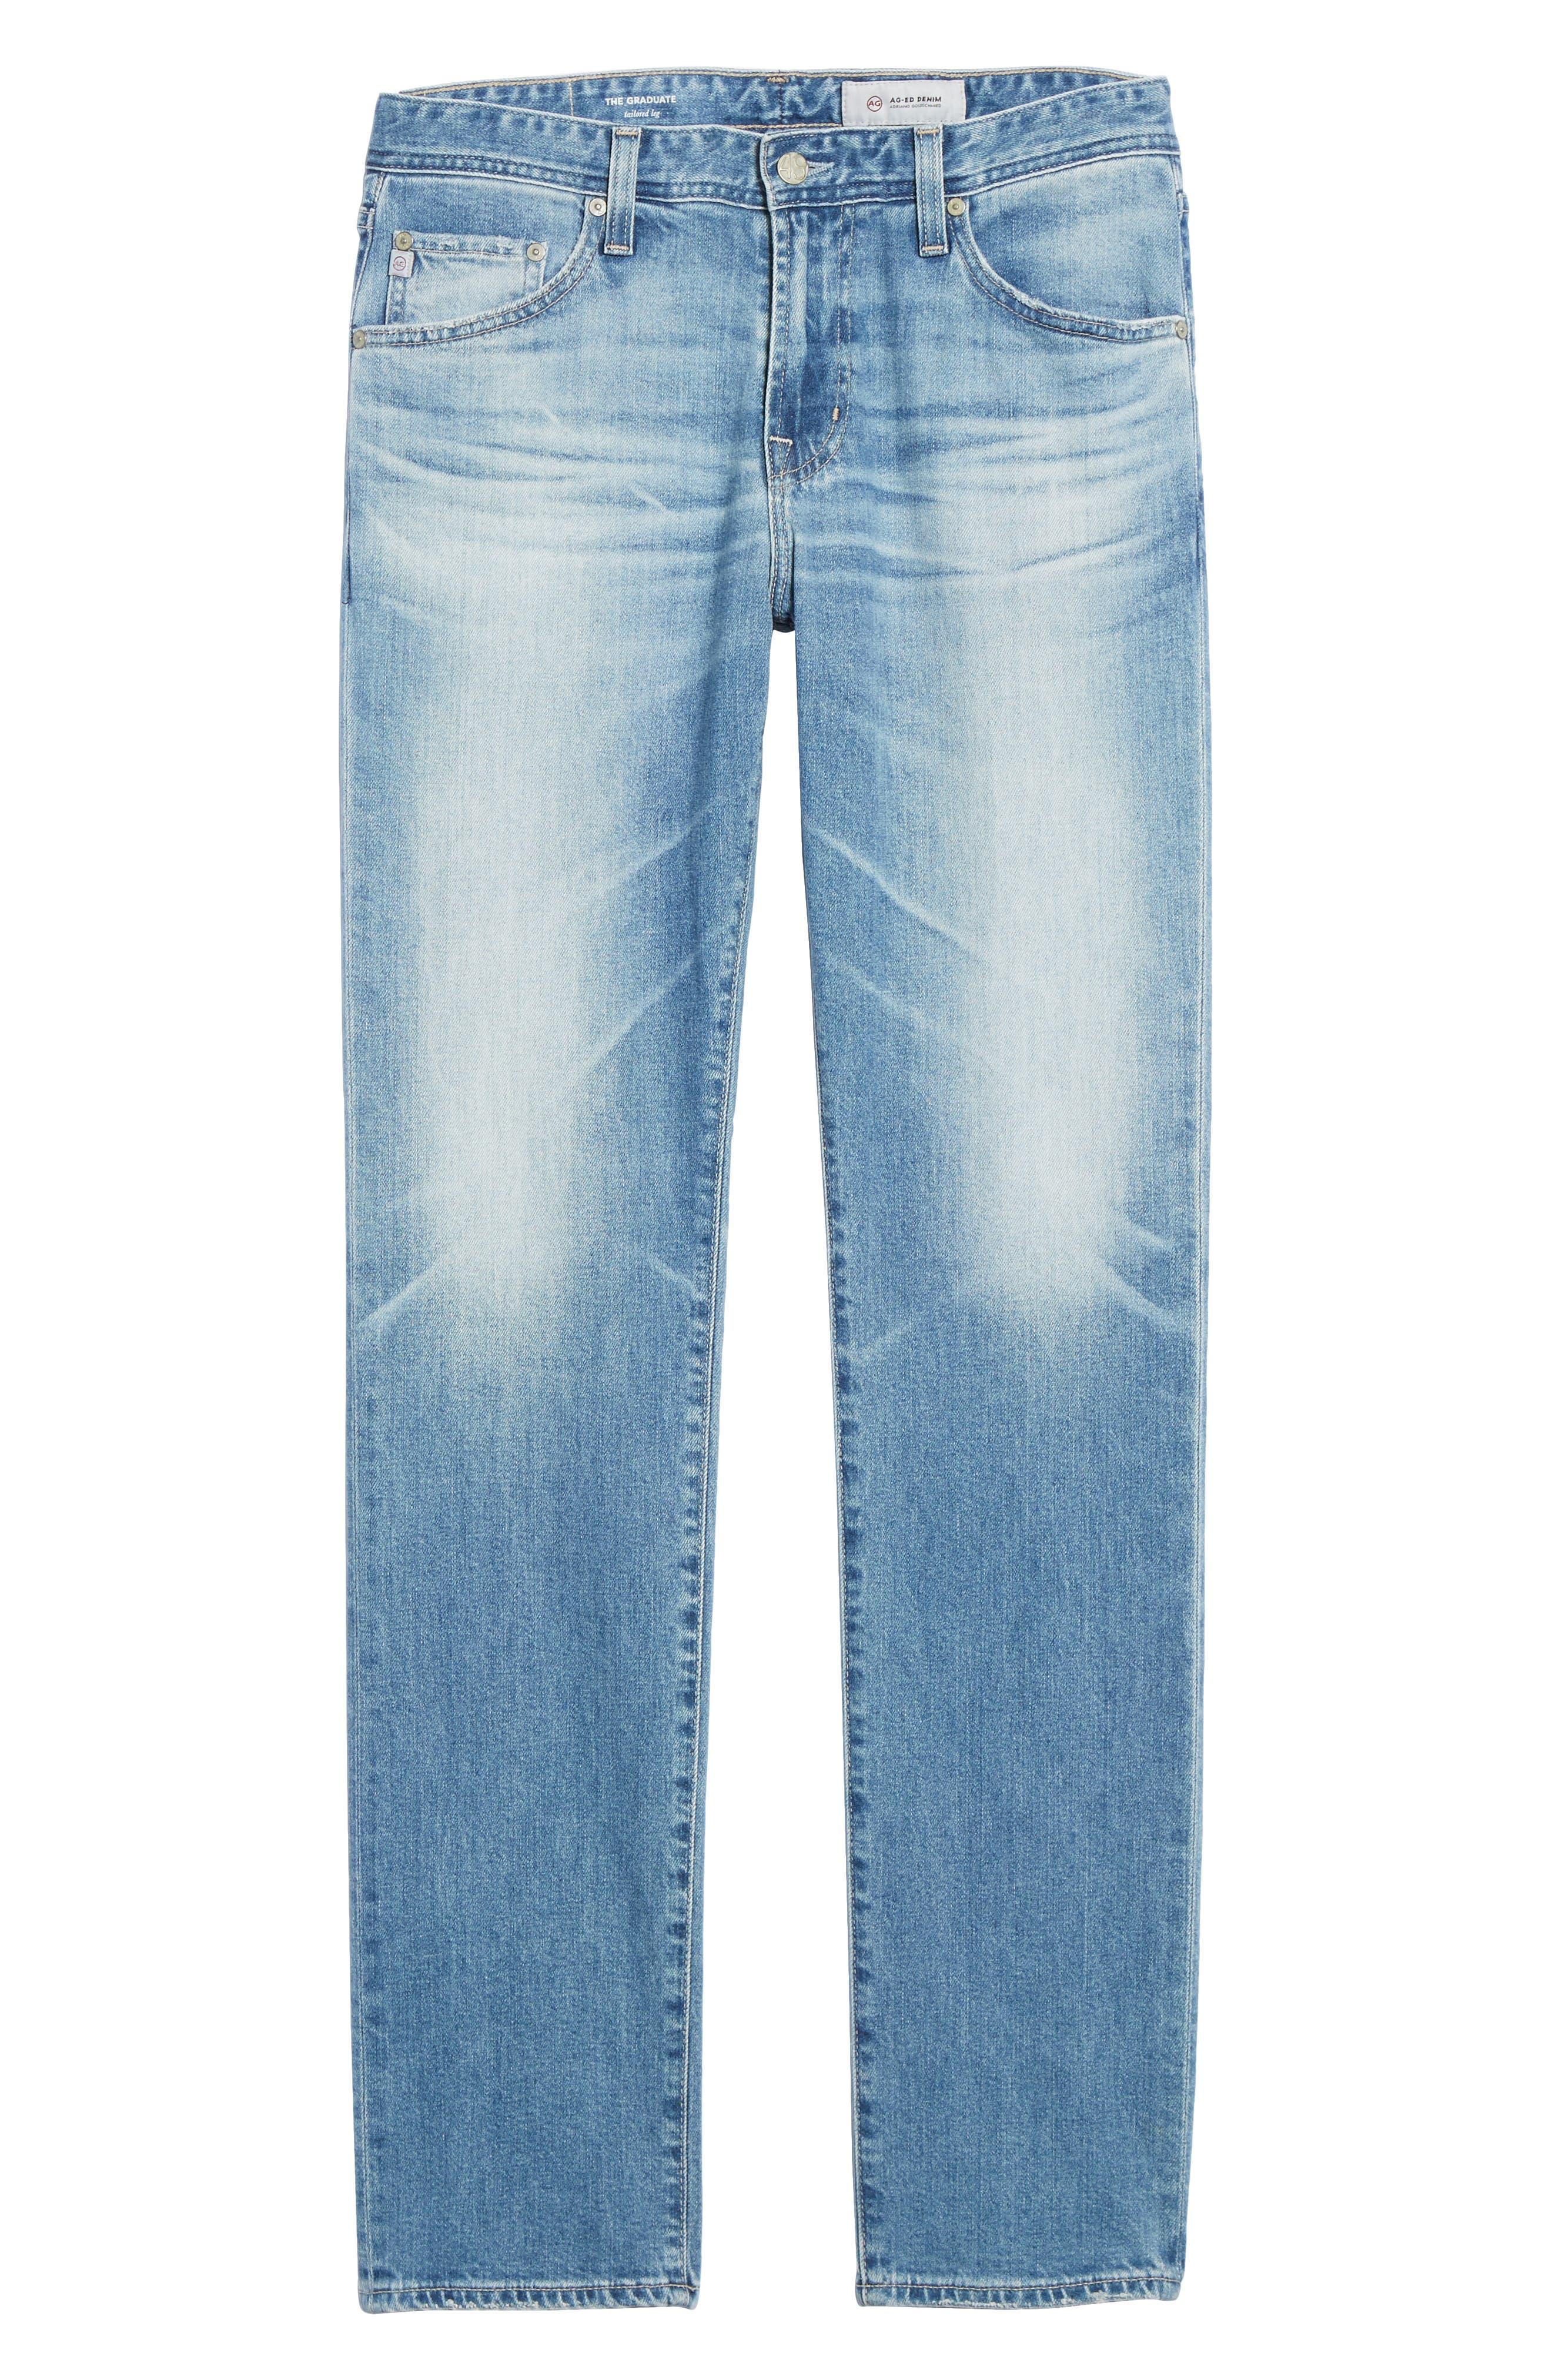 Graduate Slim Straight Leg Jeans,                             Alternate thumbnail 12, color,